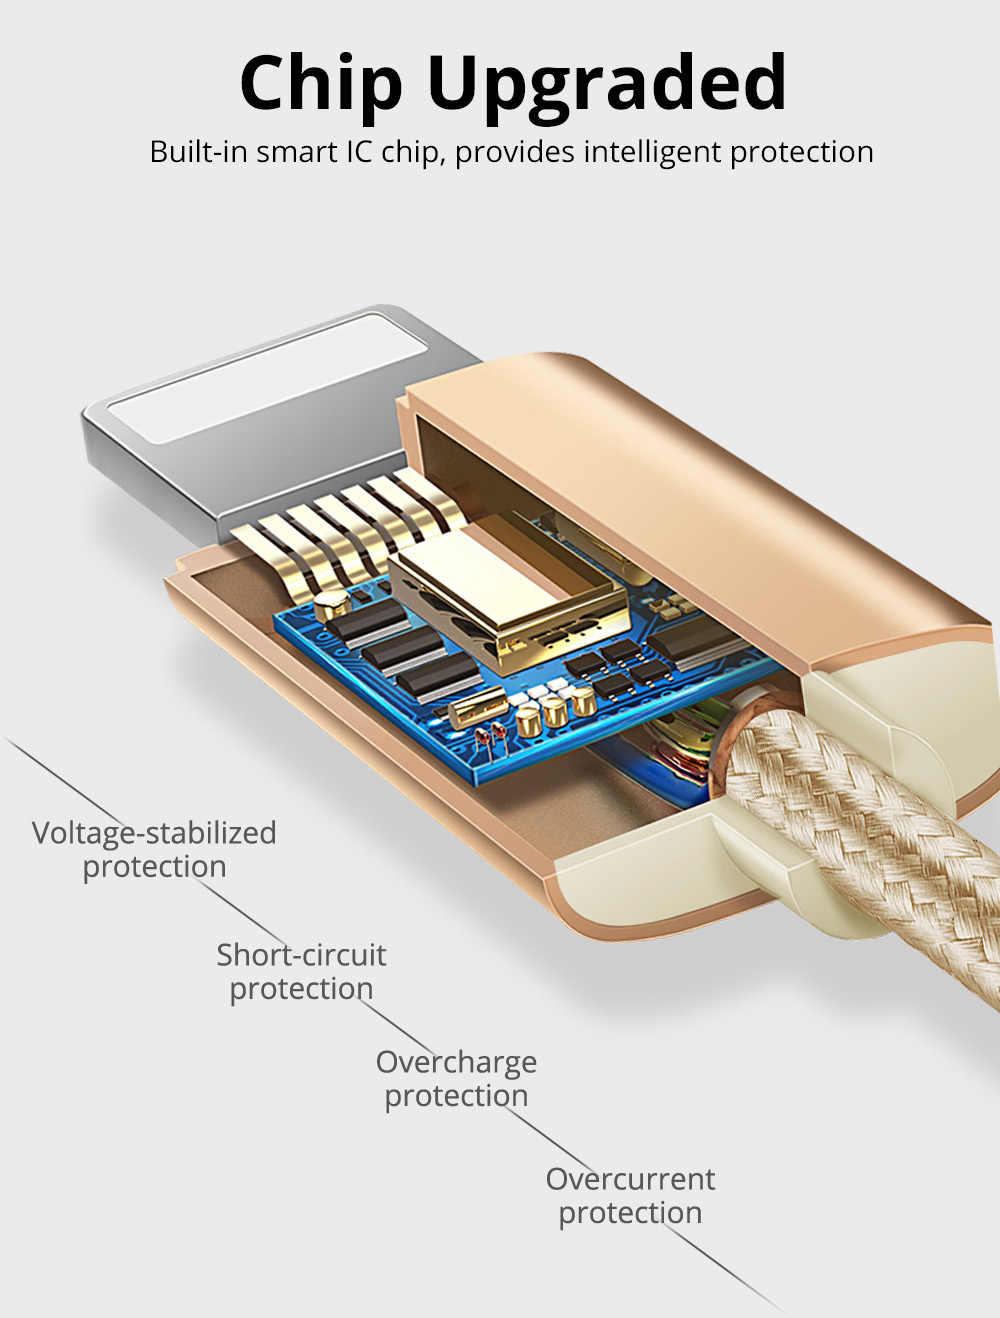 Jellico كابل يو اس بي ل كابل iphone 11 برو ماكس Xs Xr X 8 7 6 زائد 6s 5 s زائد ipad mini 4 سريع شحن كابلات الهاتف المحمول القائم